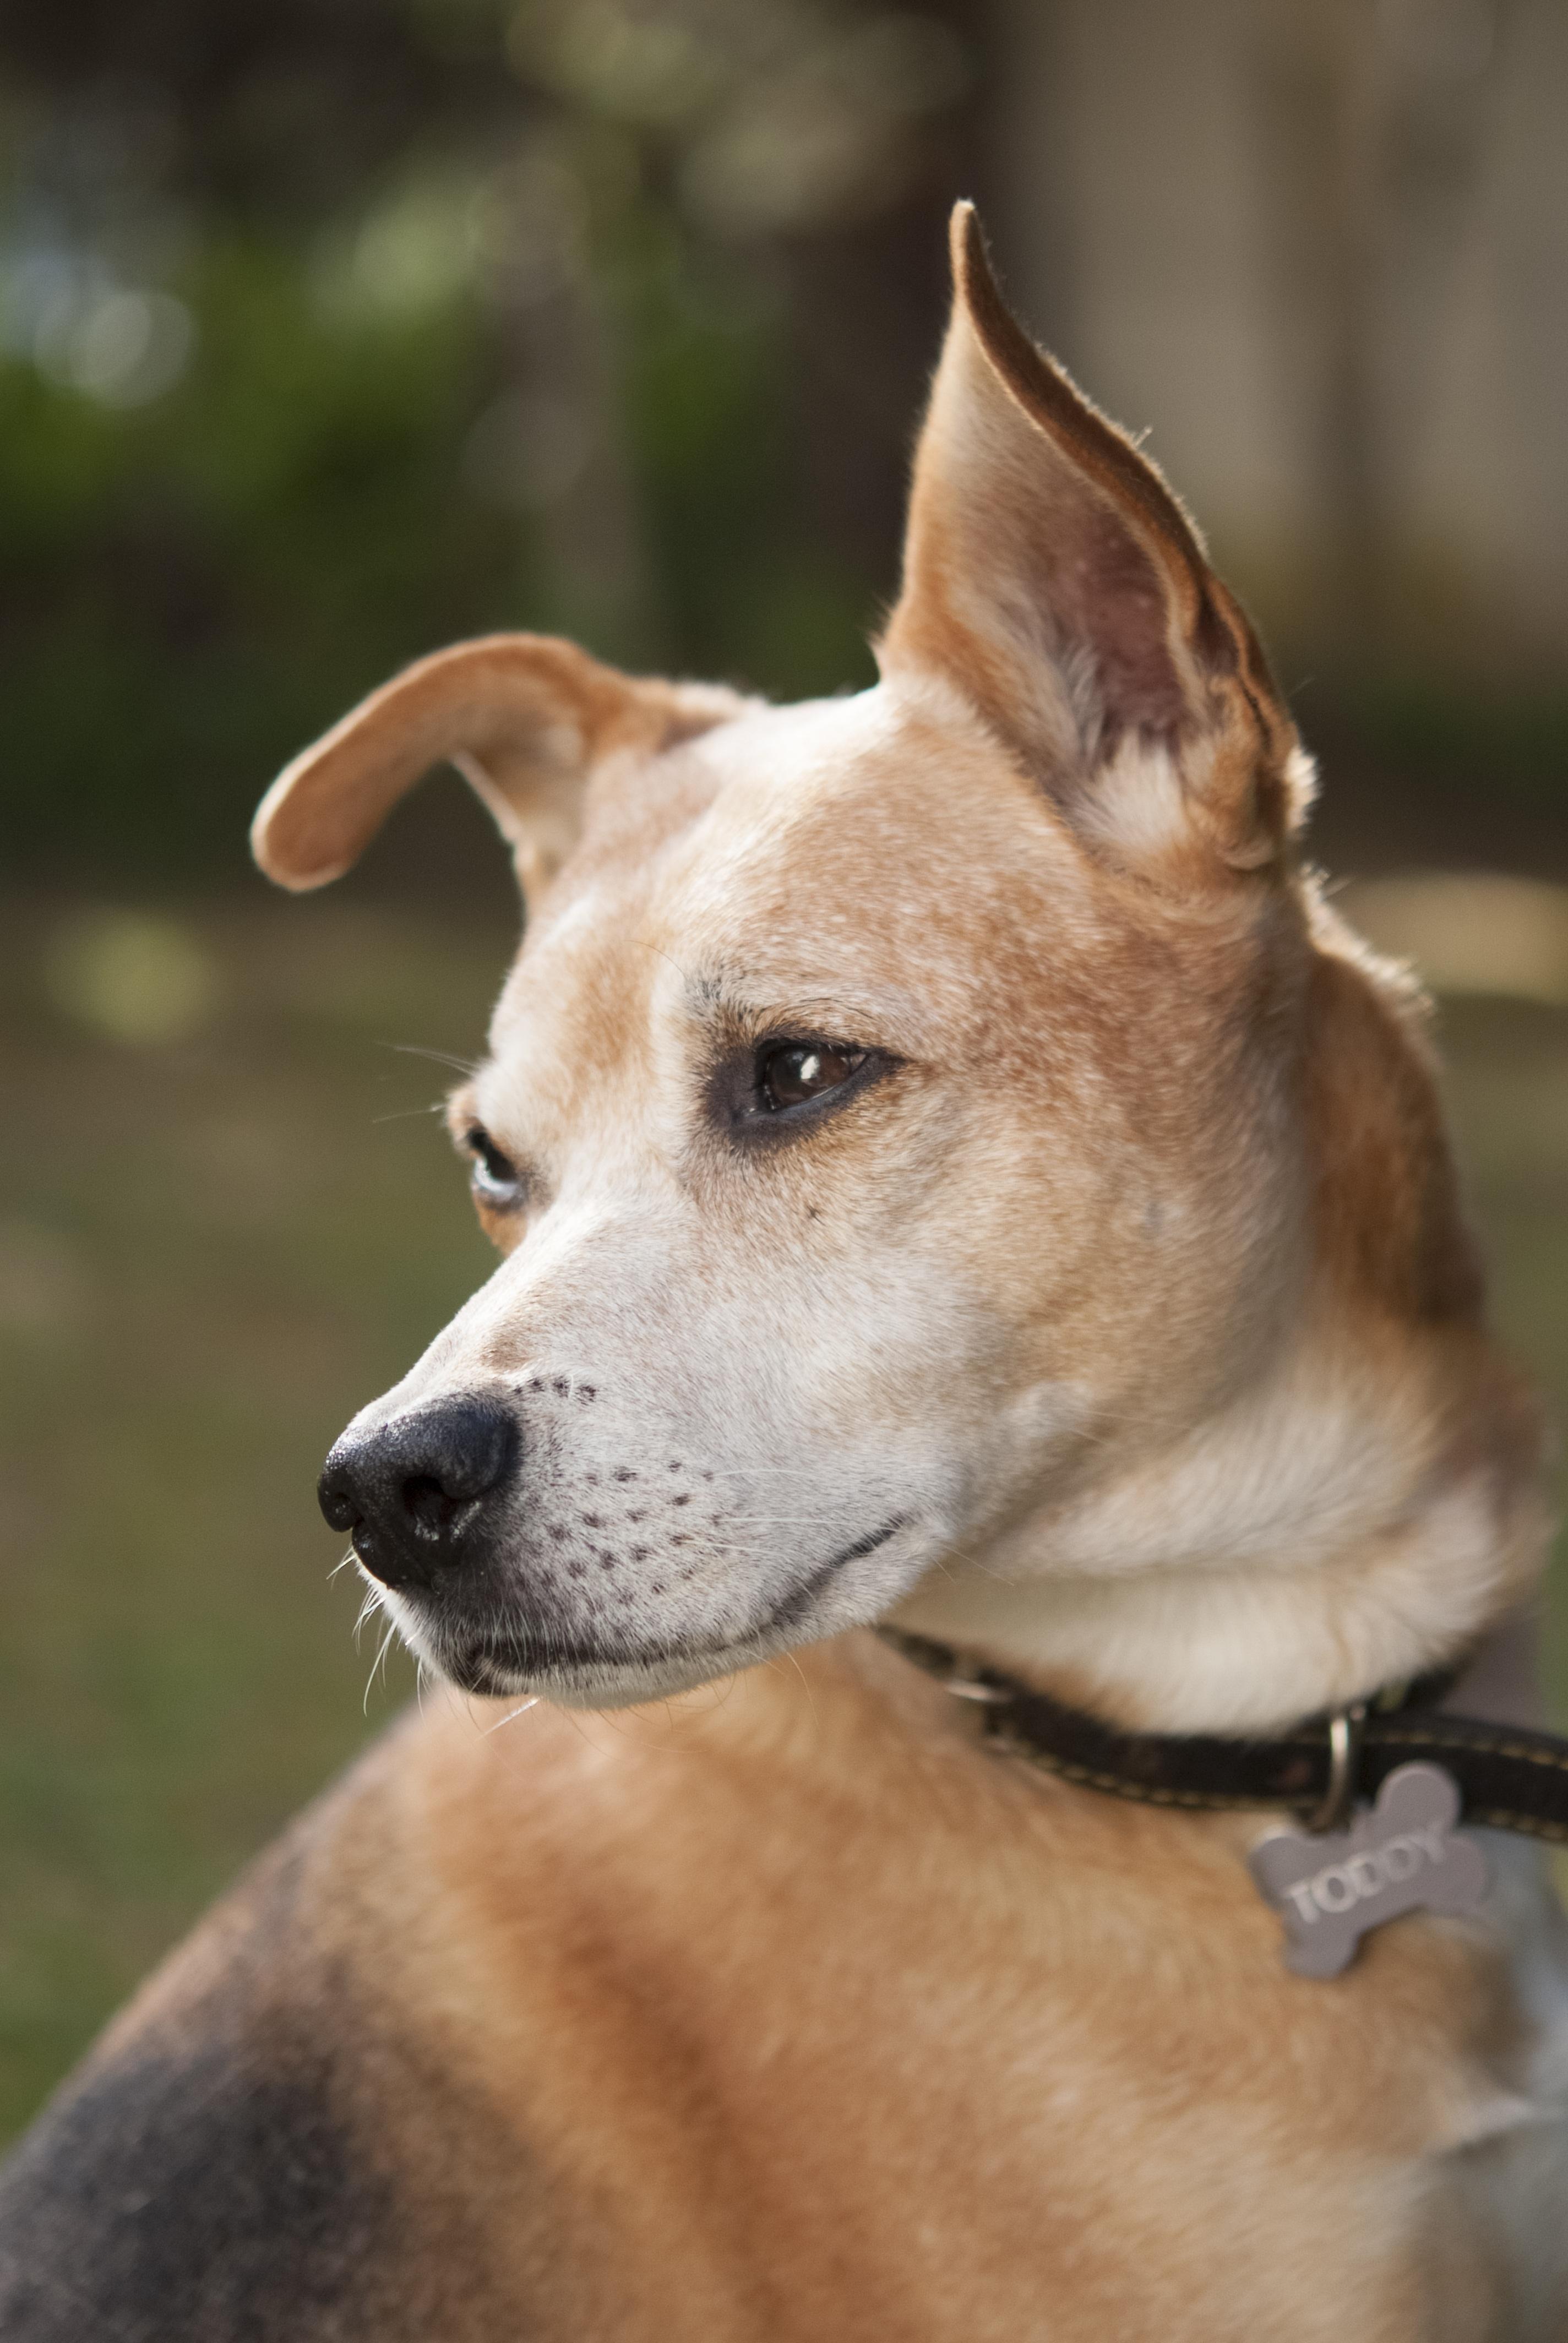 Best Fur Brown Adorable Dog - outdoor-puppy-dog-animal-cute-canine-love-pet-fur-mammal-friend-outdoors-face-vertebrate-adorable-dog-breed-dingo-street-dog-dog-like-mammal-animal-sports-pariah-dog-carolina-dog-805092  Gallery_661017  .jpg